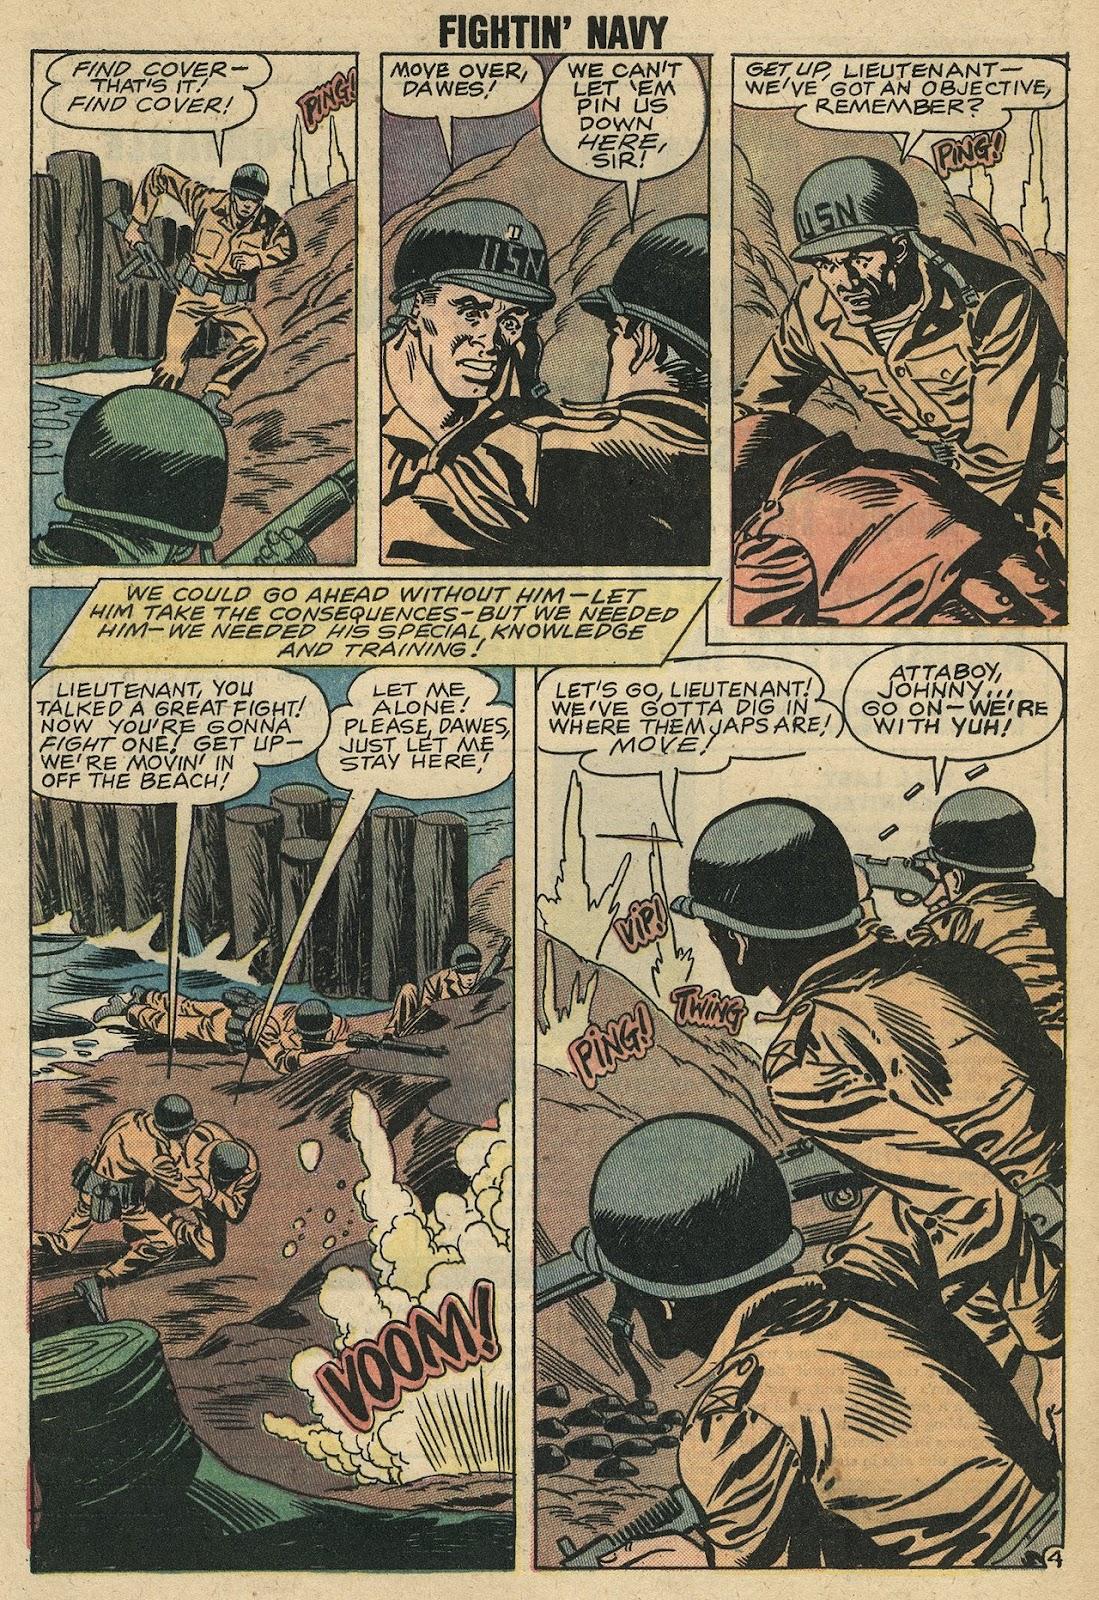 Read online Fightin' Navy comic -  Issue #86 - 31